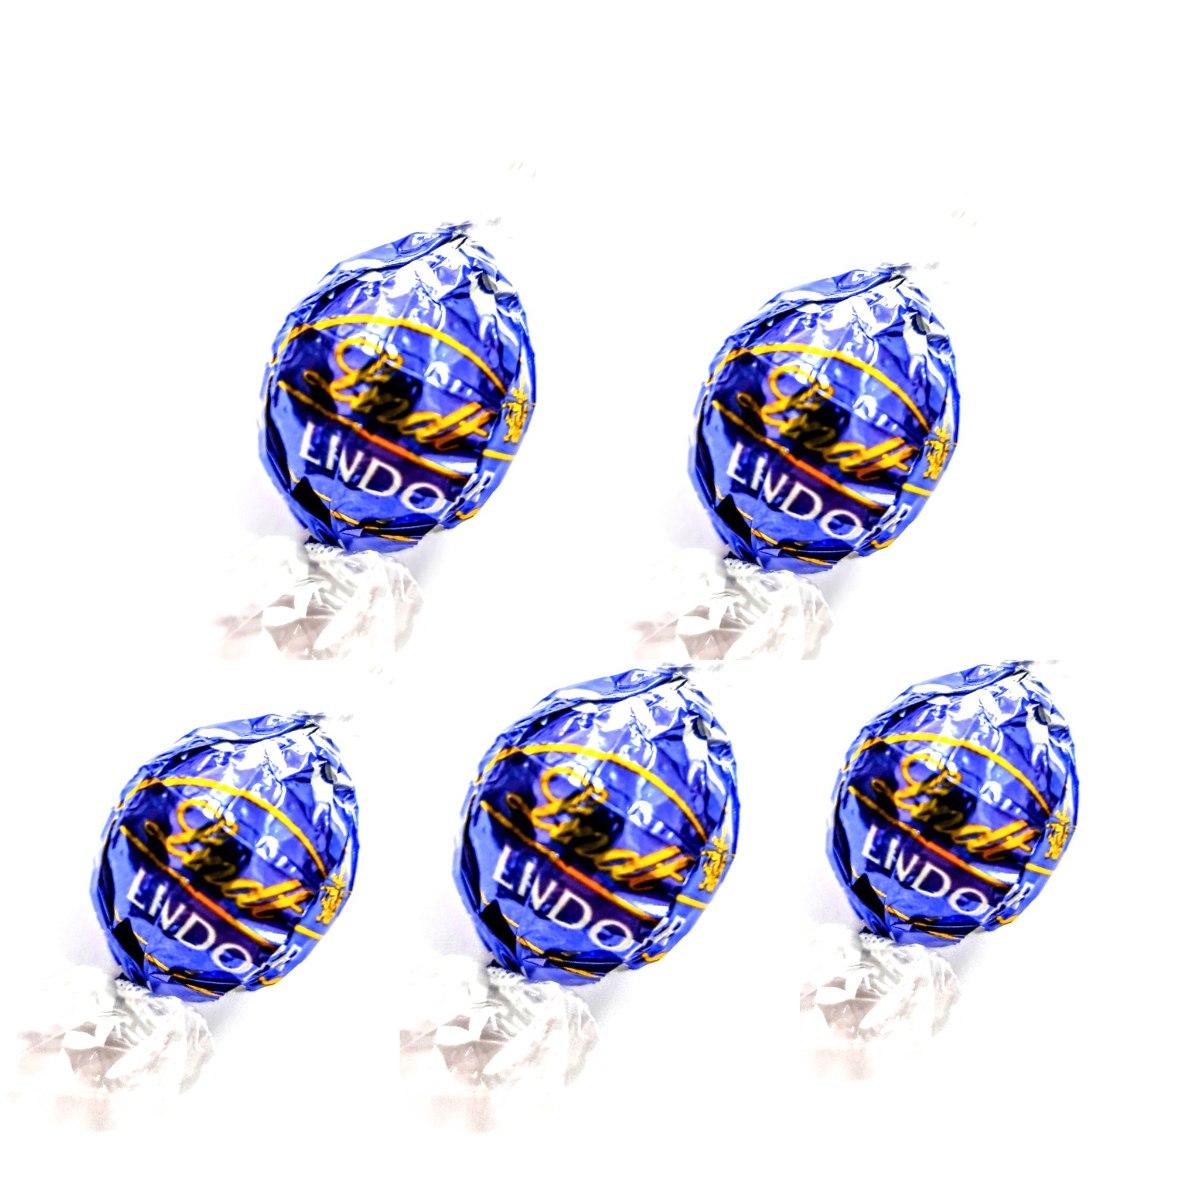 Lindor בתפזורת! קרם שוקולד לבן 200 גרם